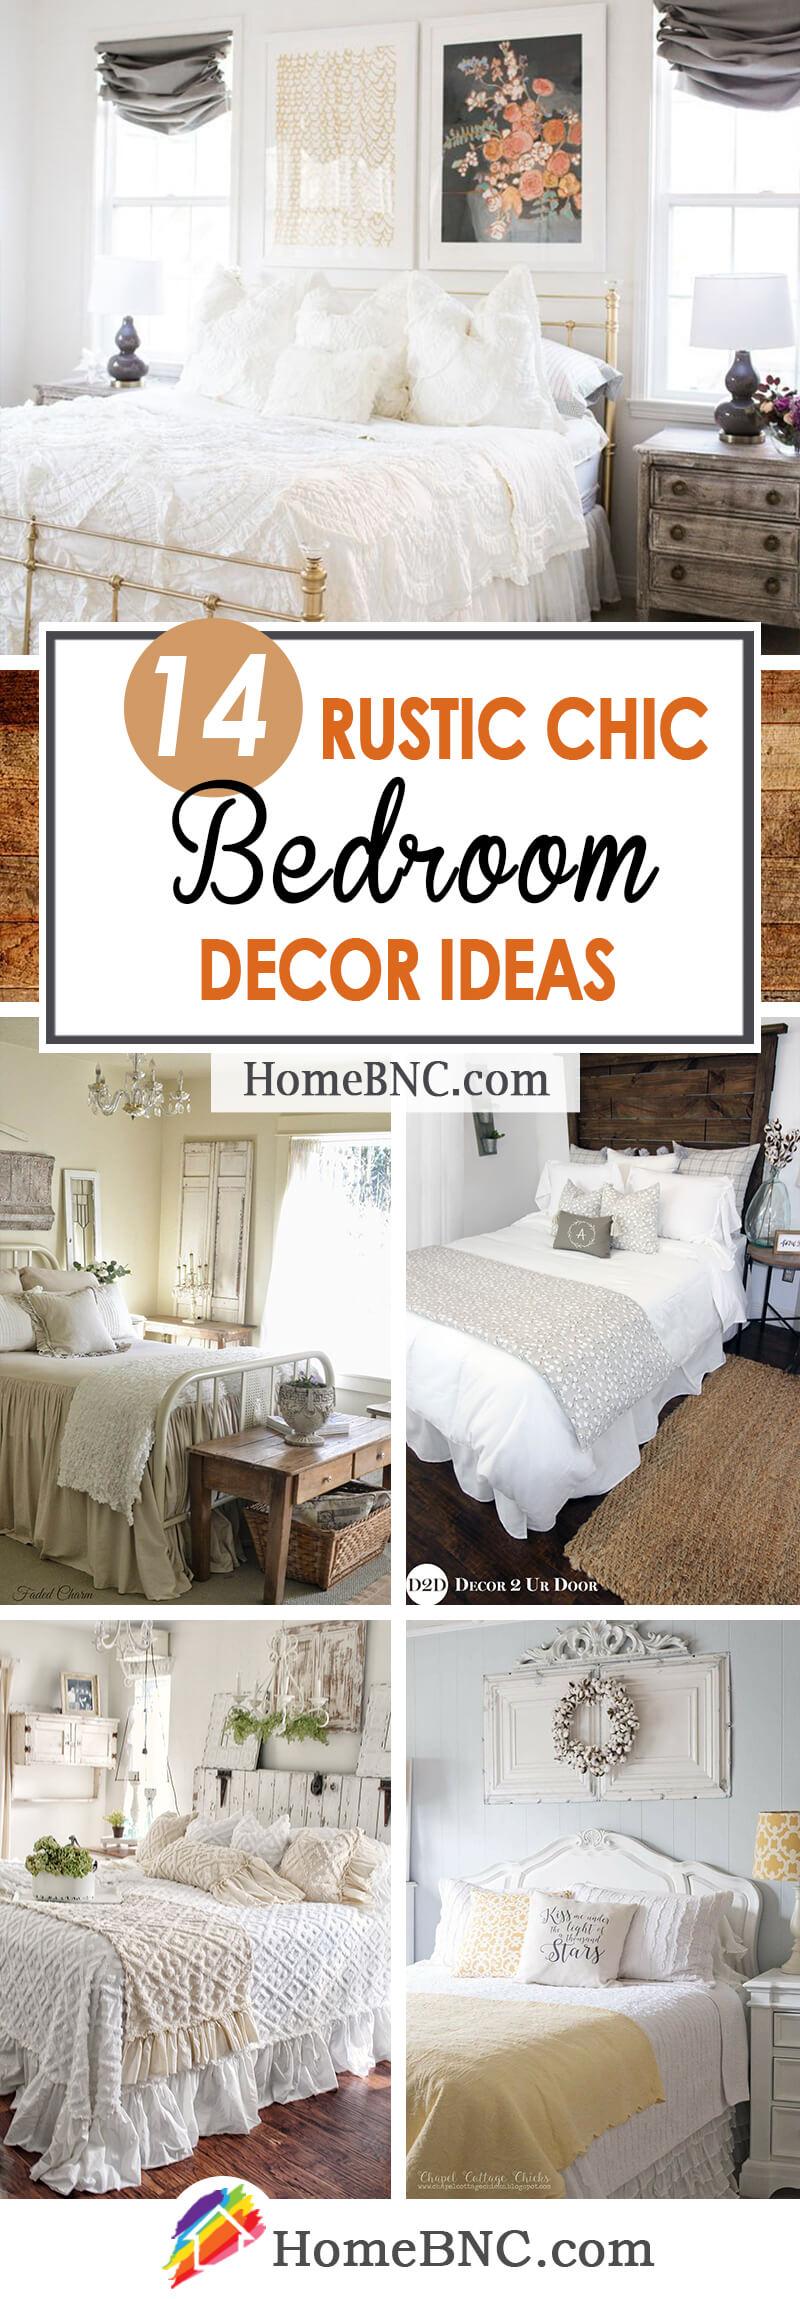 Rustic Chic Bedroom Decoration Ideas